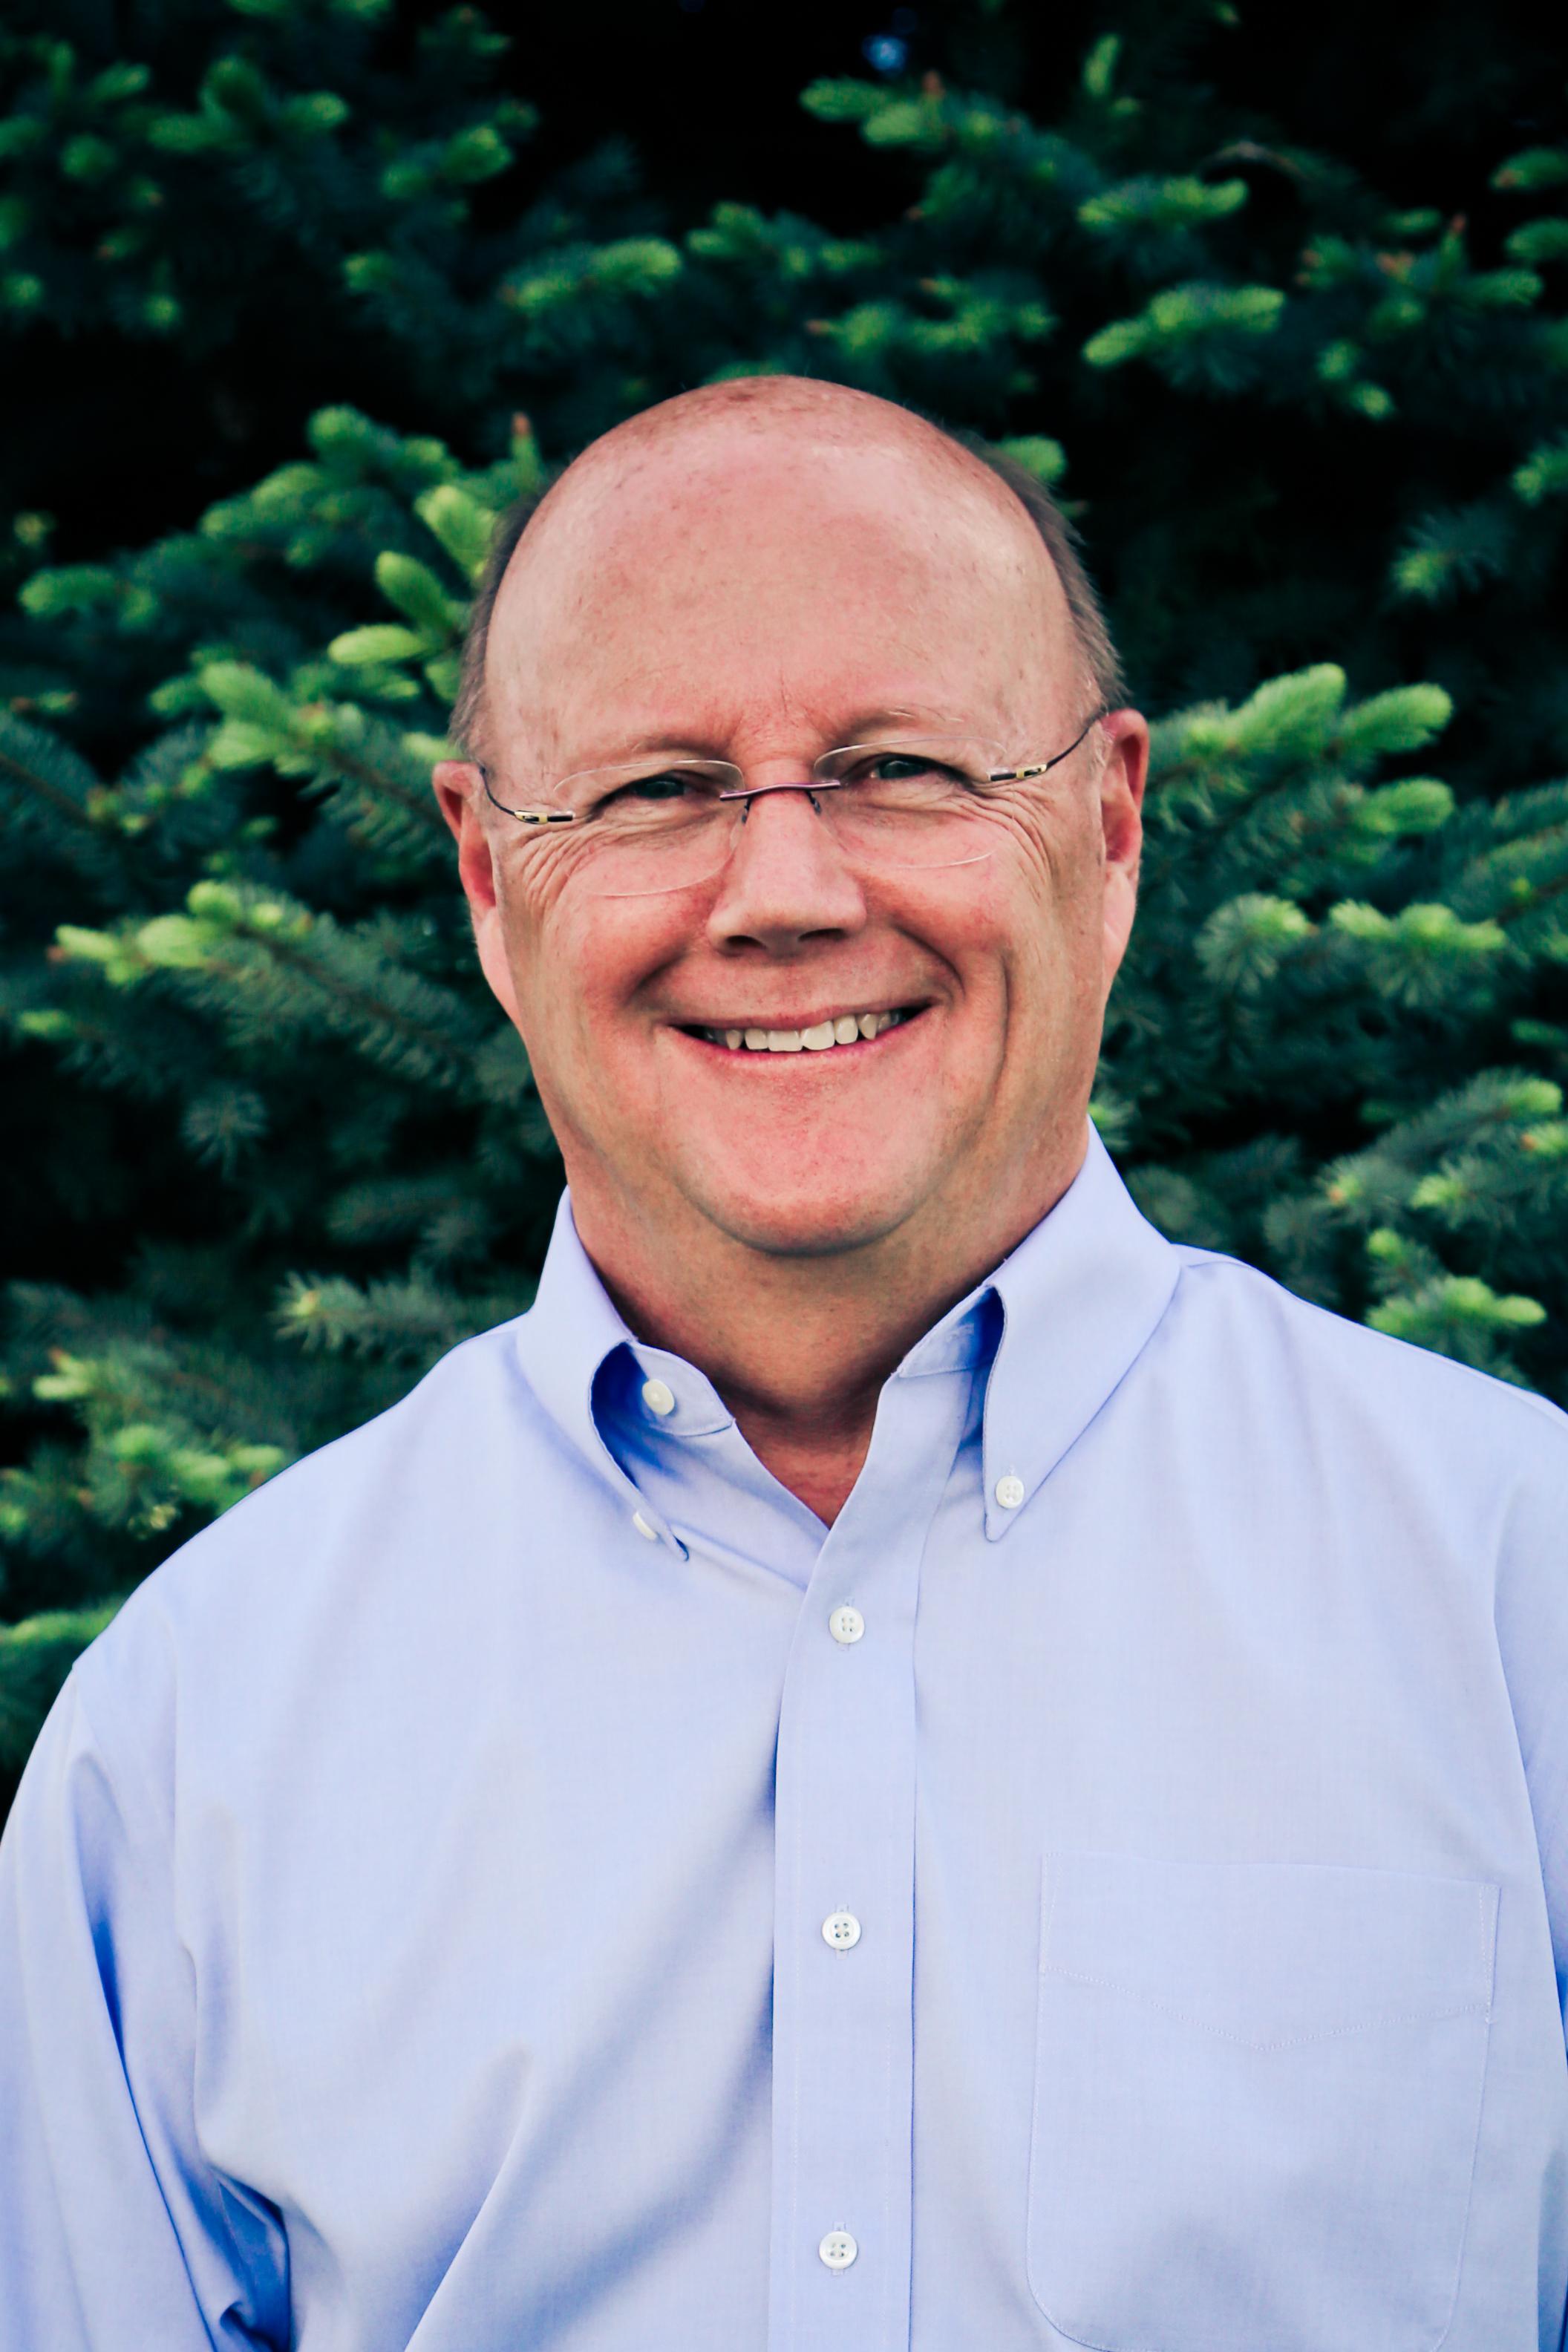 Dr. Larry E. Brazil, Chairman